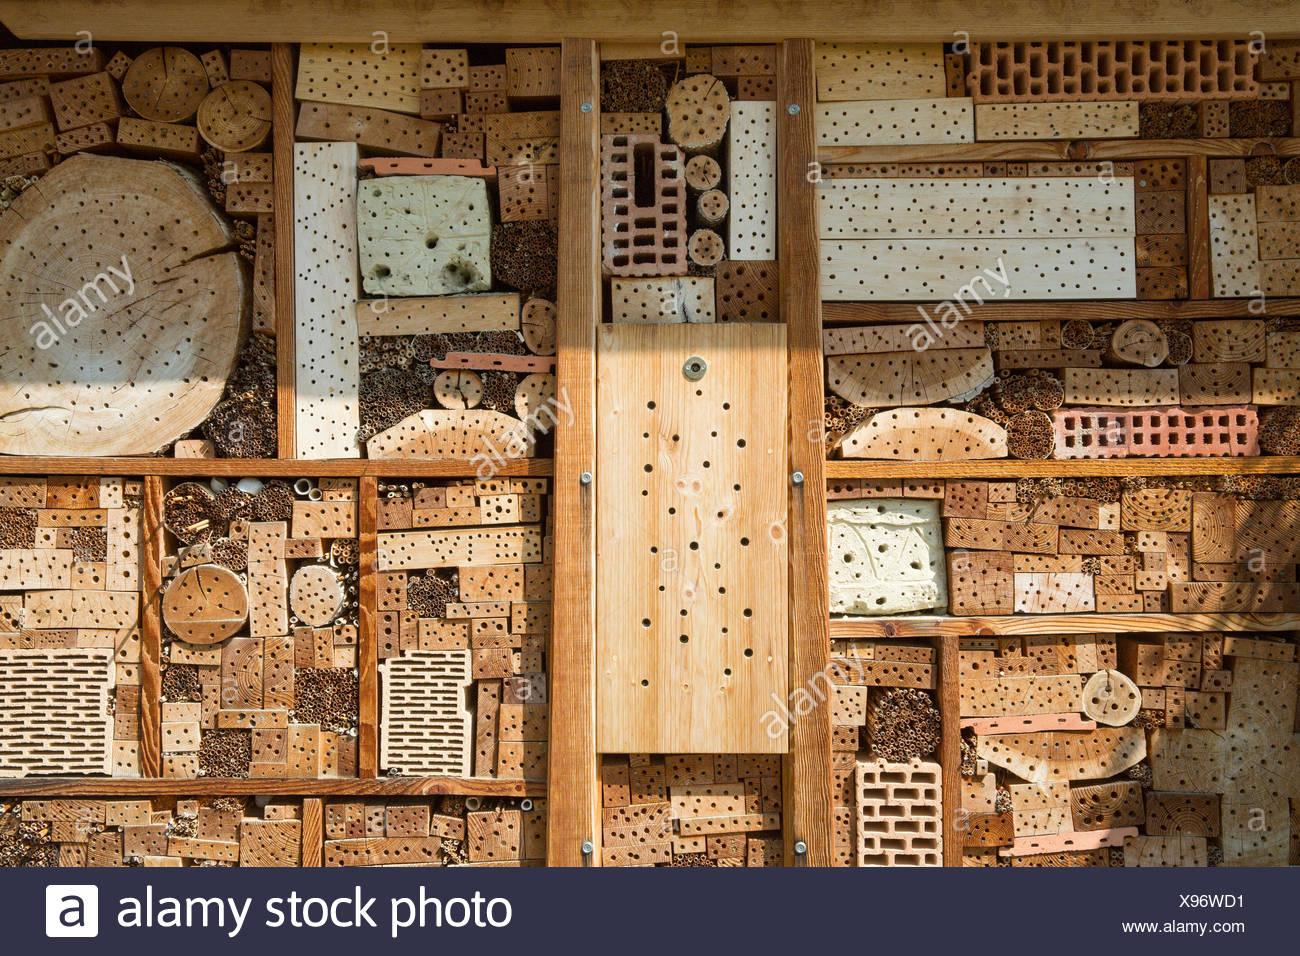 Rhine Valley, wild bees, beehive, SG, canton St. Gallen, animals, animal, bees, Switzerland, Europe, - Stock Image